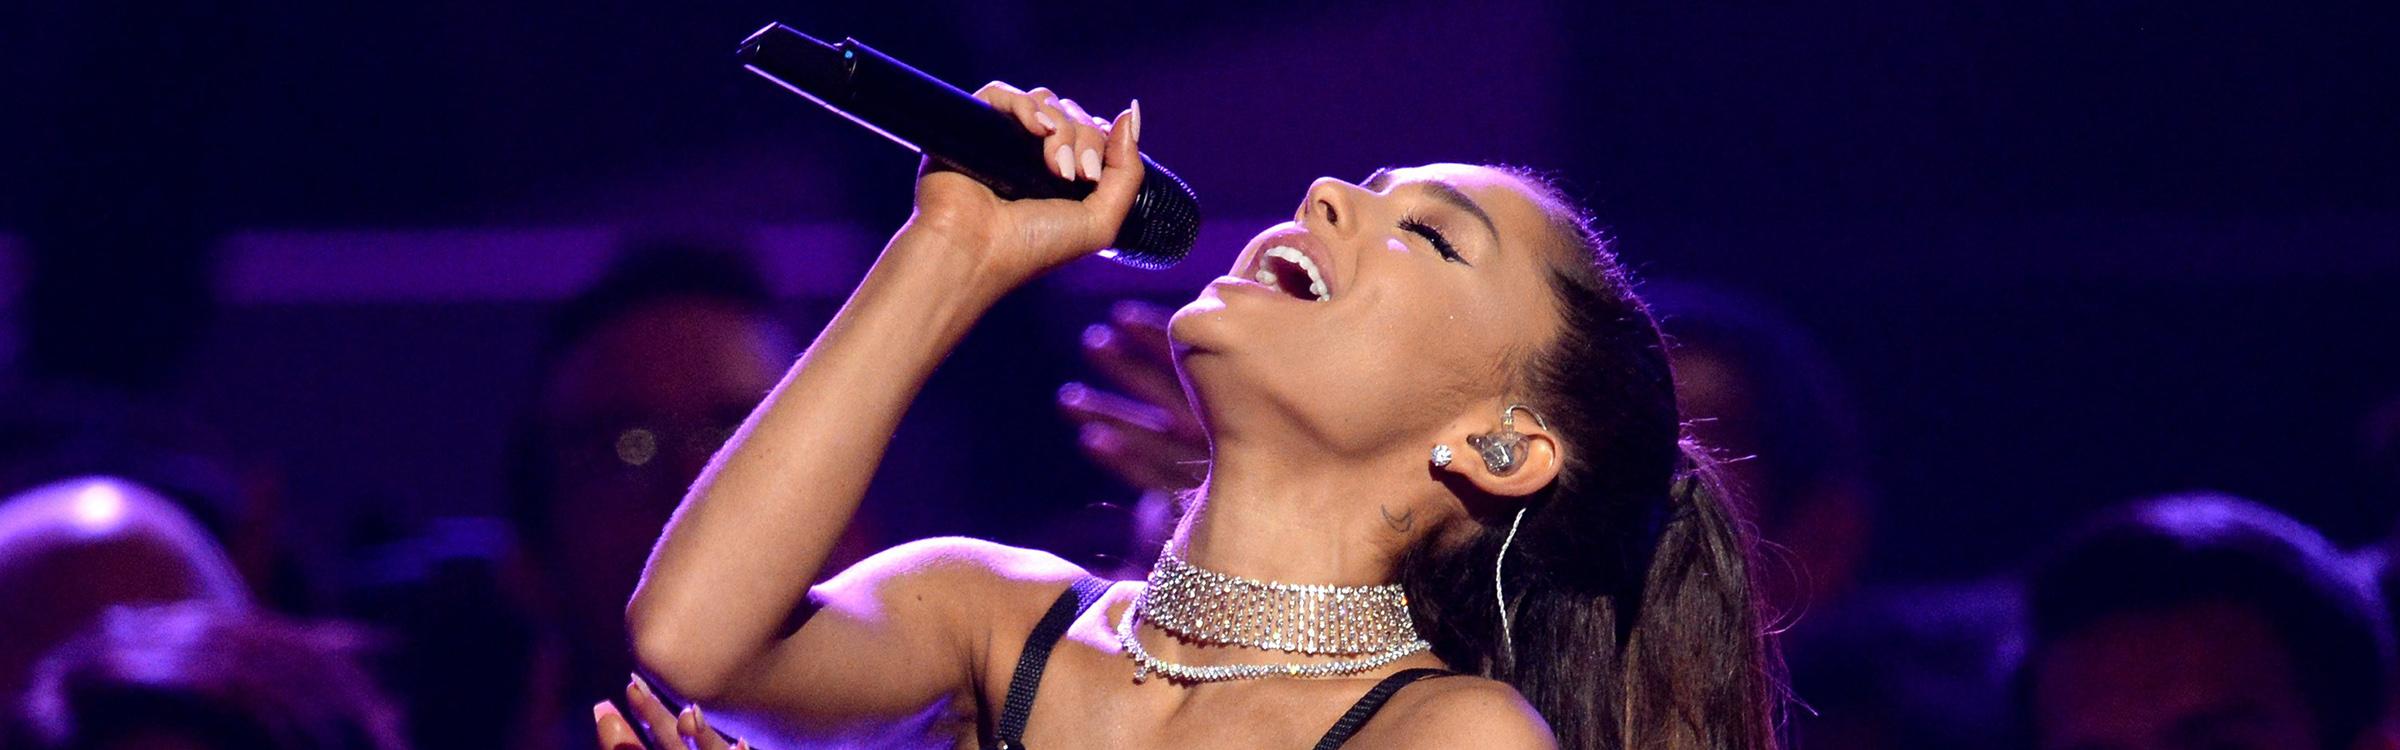 Ariana grande header